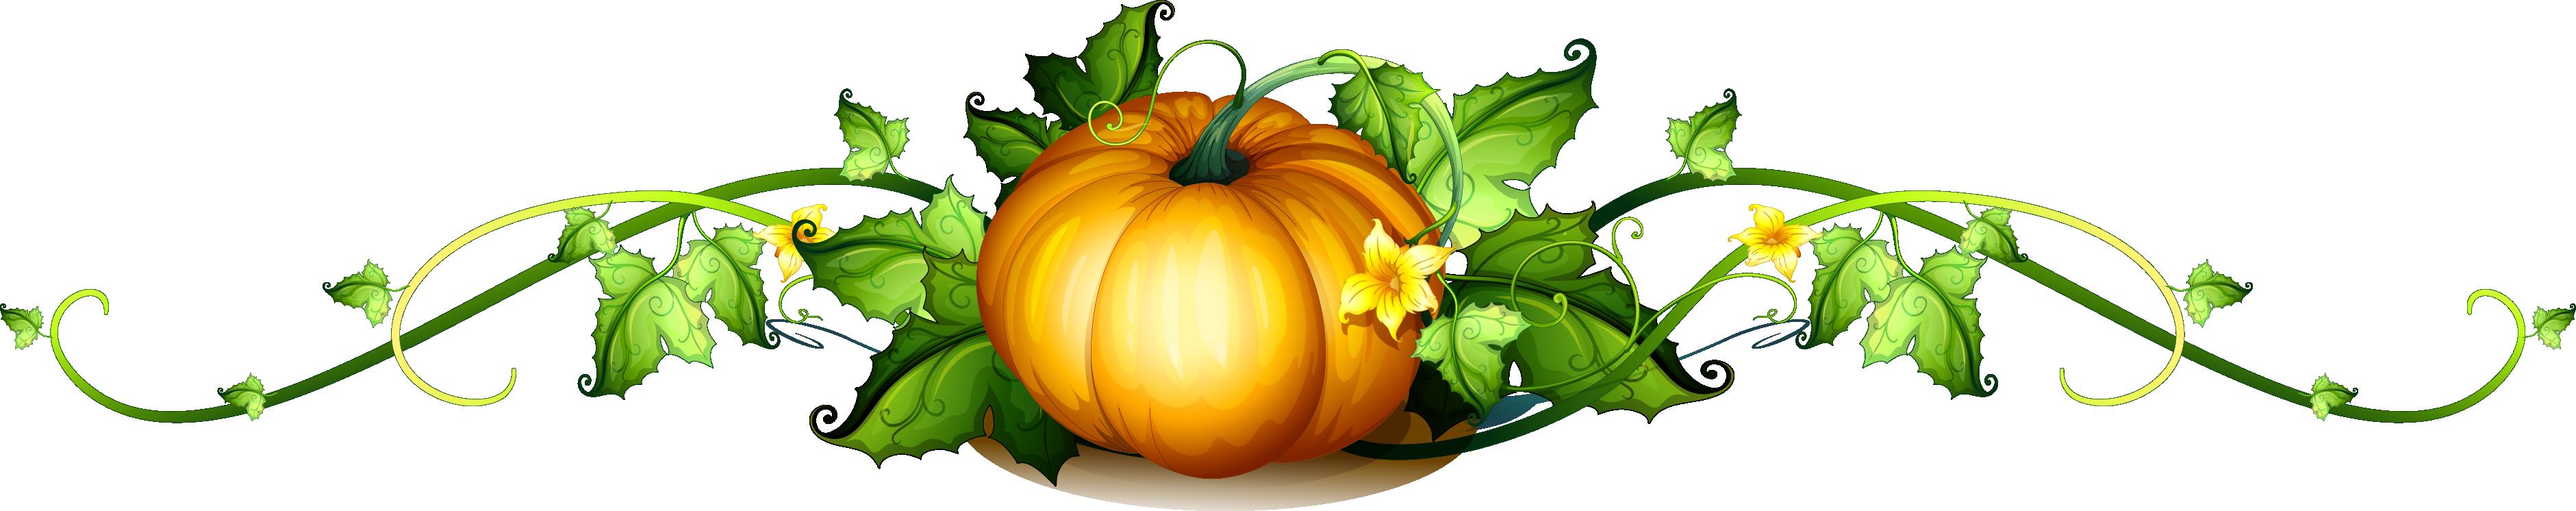 Clipart pumpkin vegetable. Vine royalty free clip